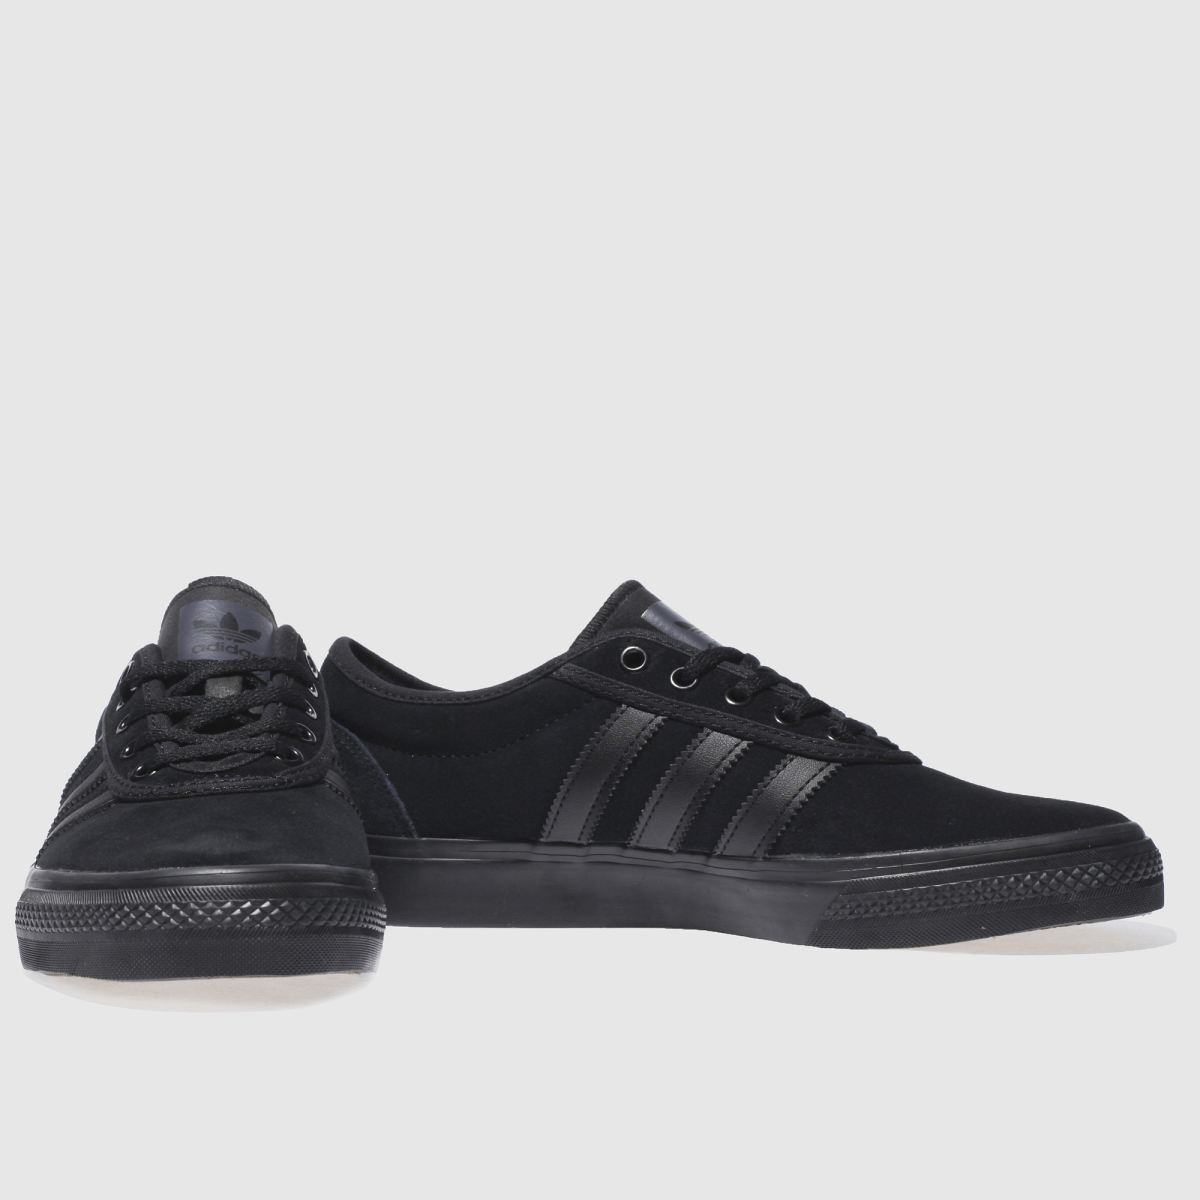 Herren Schwarz adidas Qualität skateboarding Adi-ease Sneaker   schuh Gute Qualität adidas beliebte Schuhe 7005e3